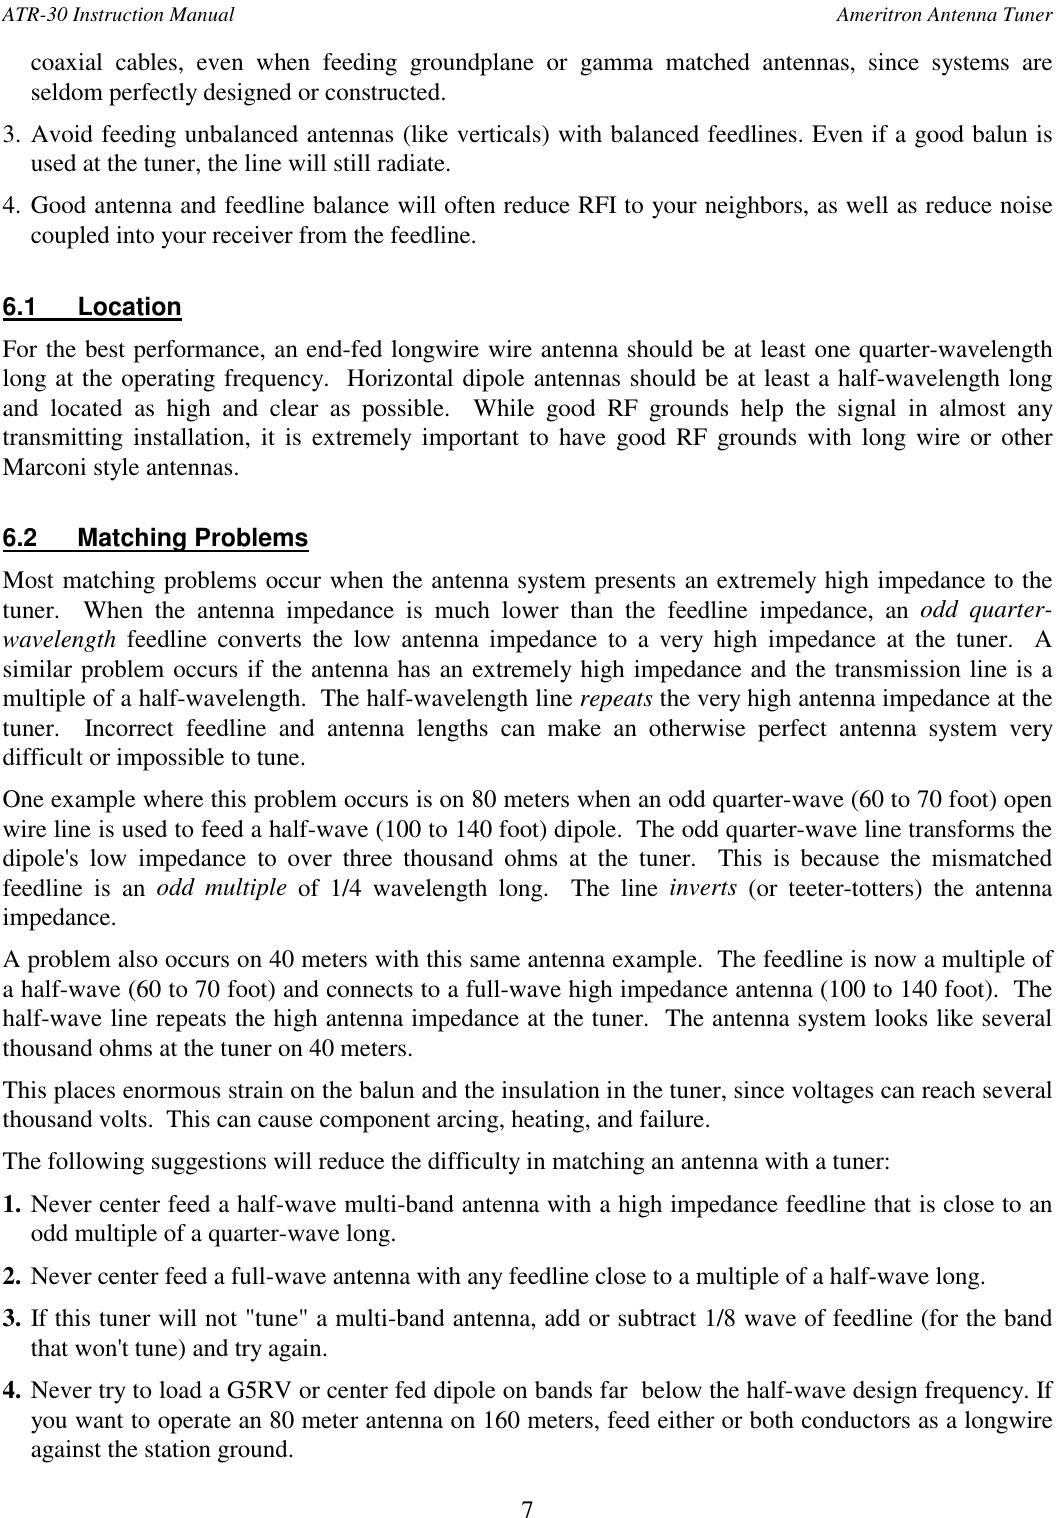 Ameritron Antenna Tuner ATR 30X User Manual